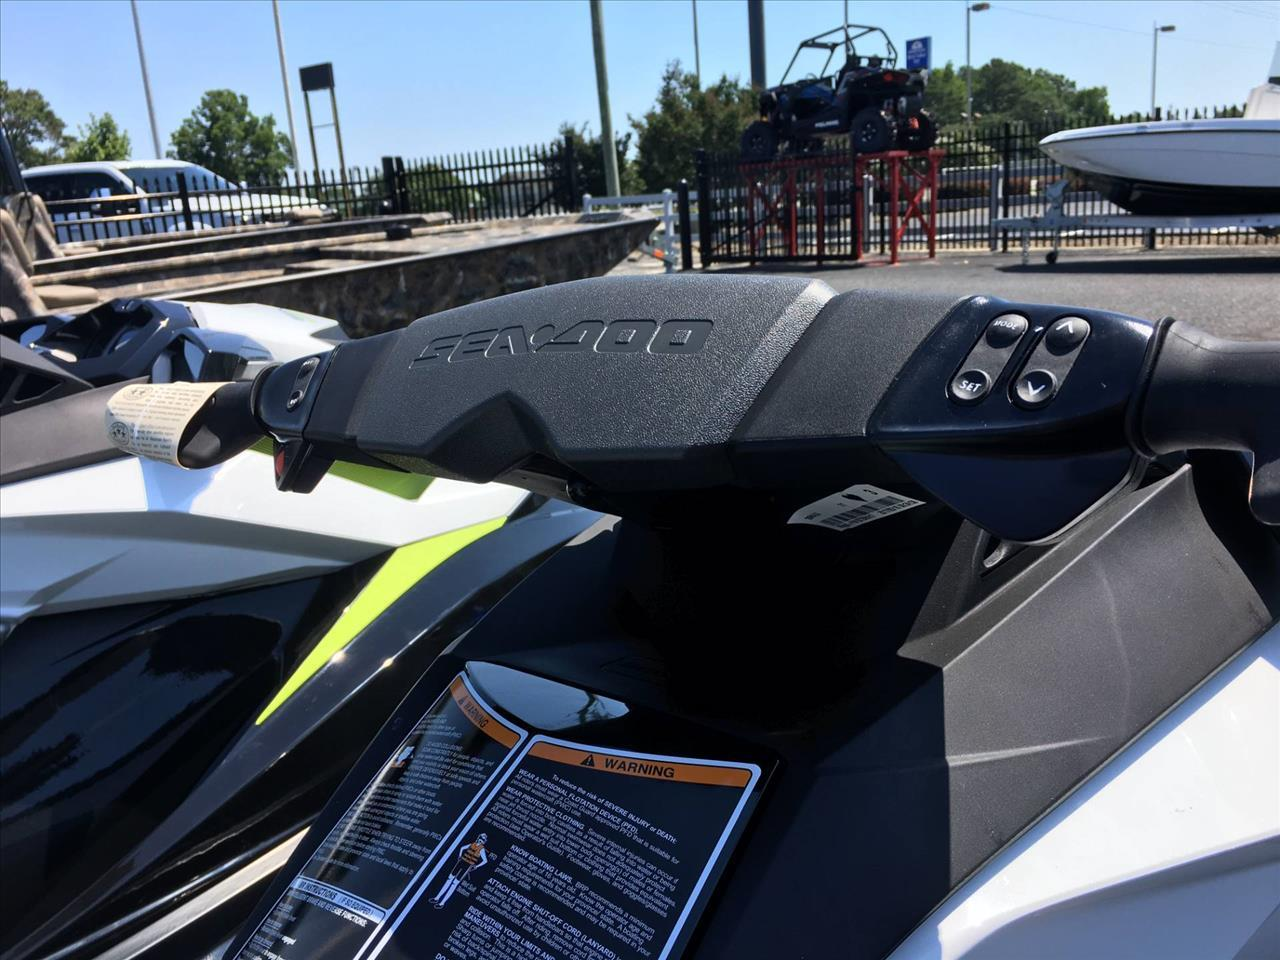 2017 Sea-Doo GTI SE 130 for sale at Vehicle Network, LLC - Performance East, INC. in Goldsboro NC